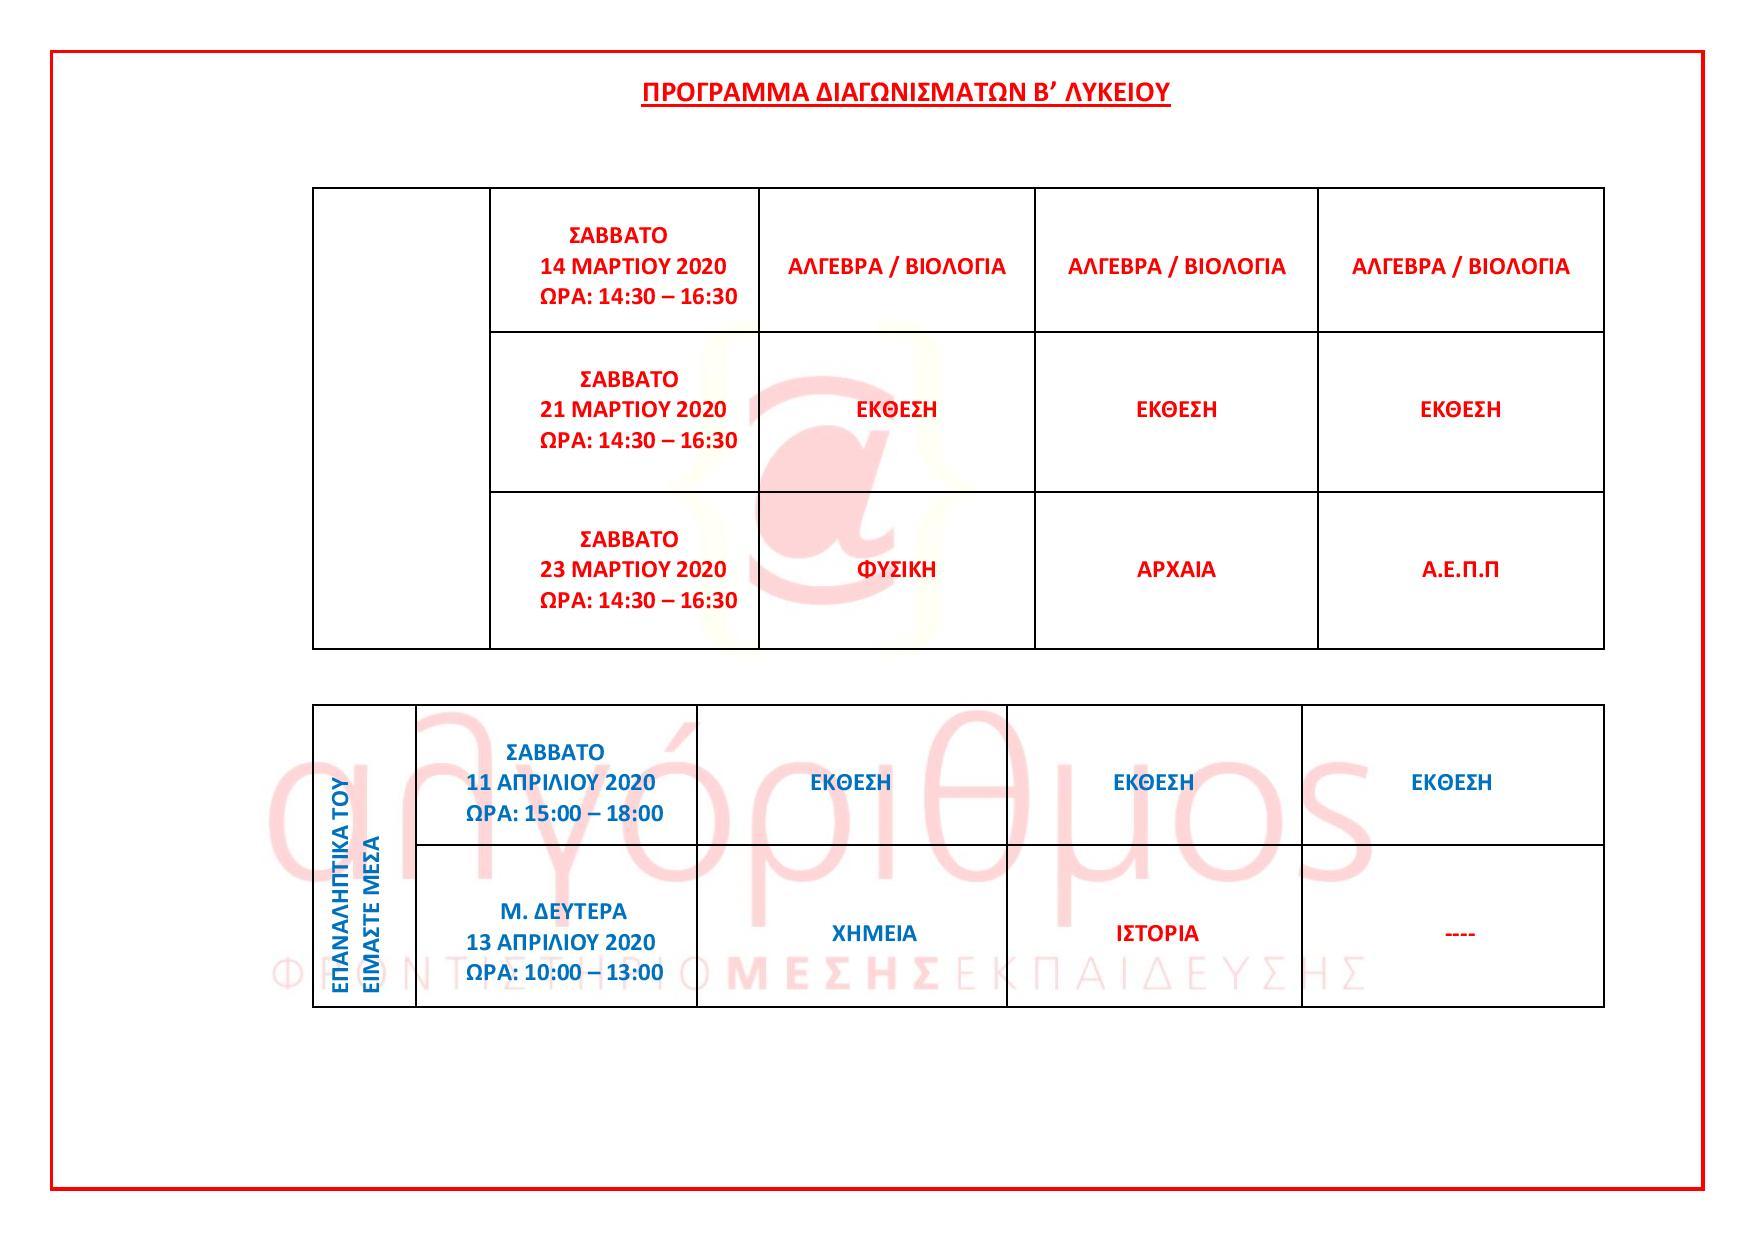 diagonismata-b-likeiou-b-kiklos.jpg-2